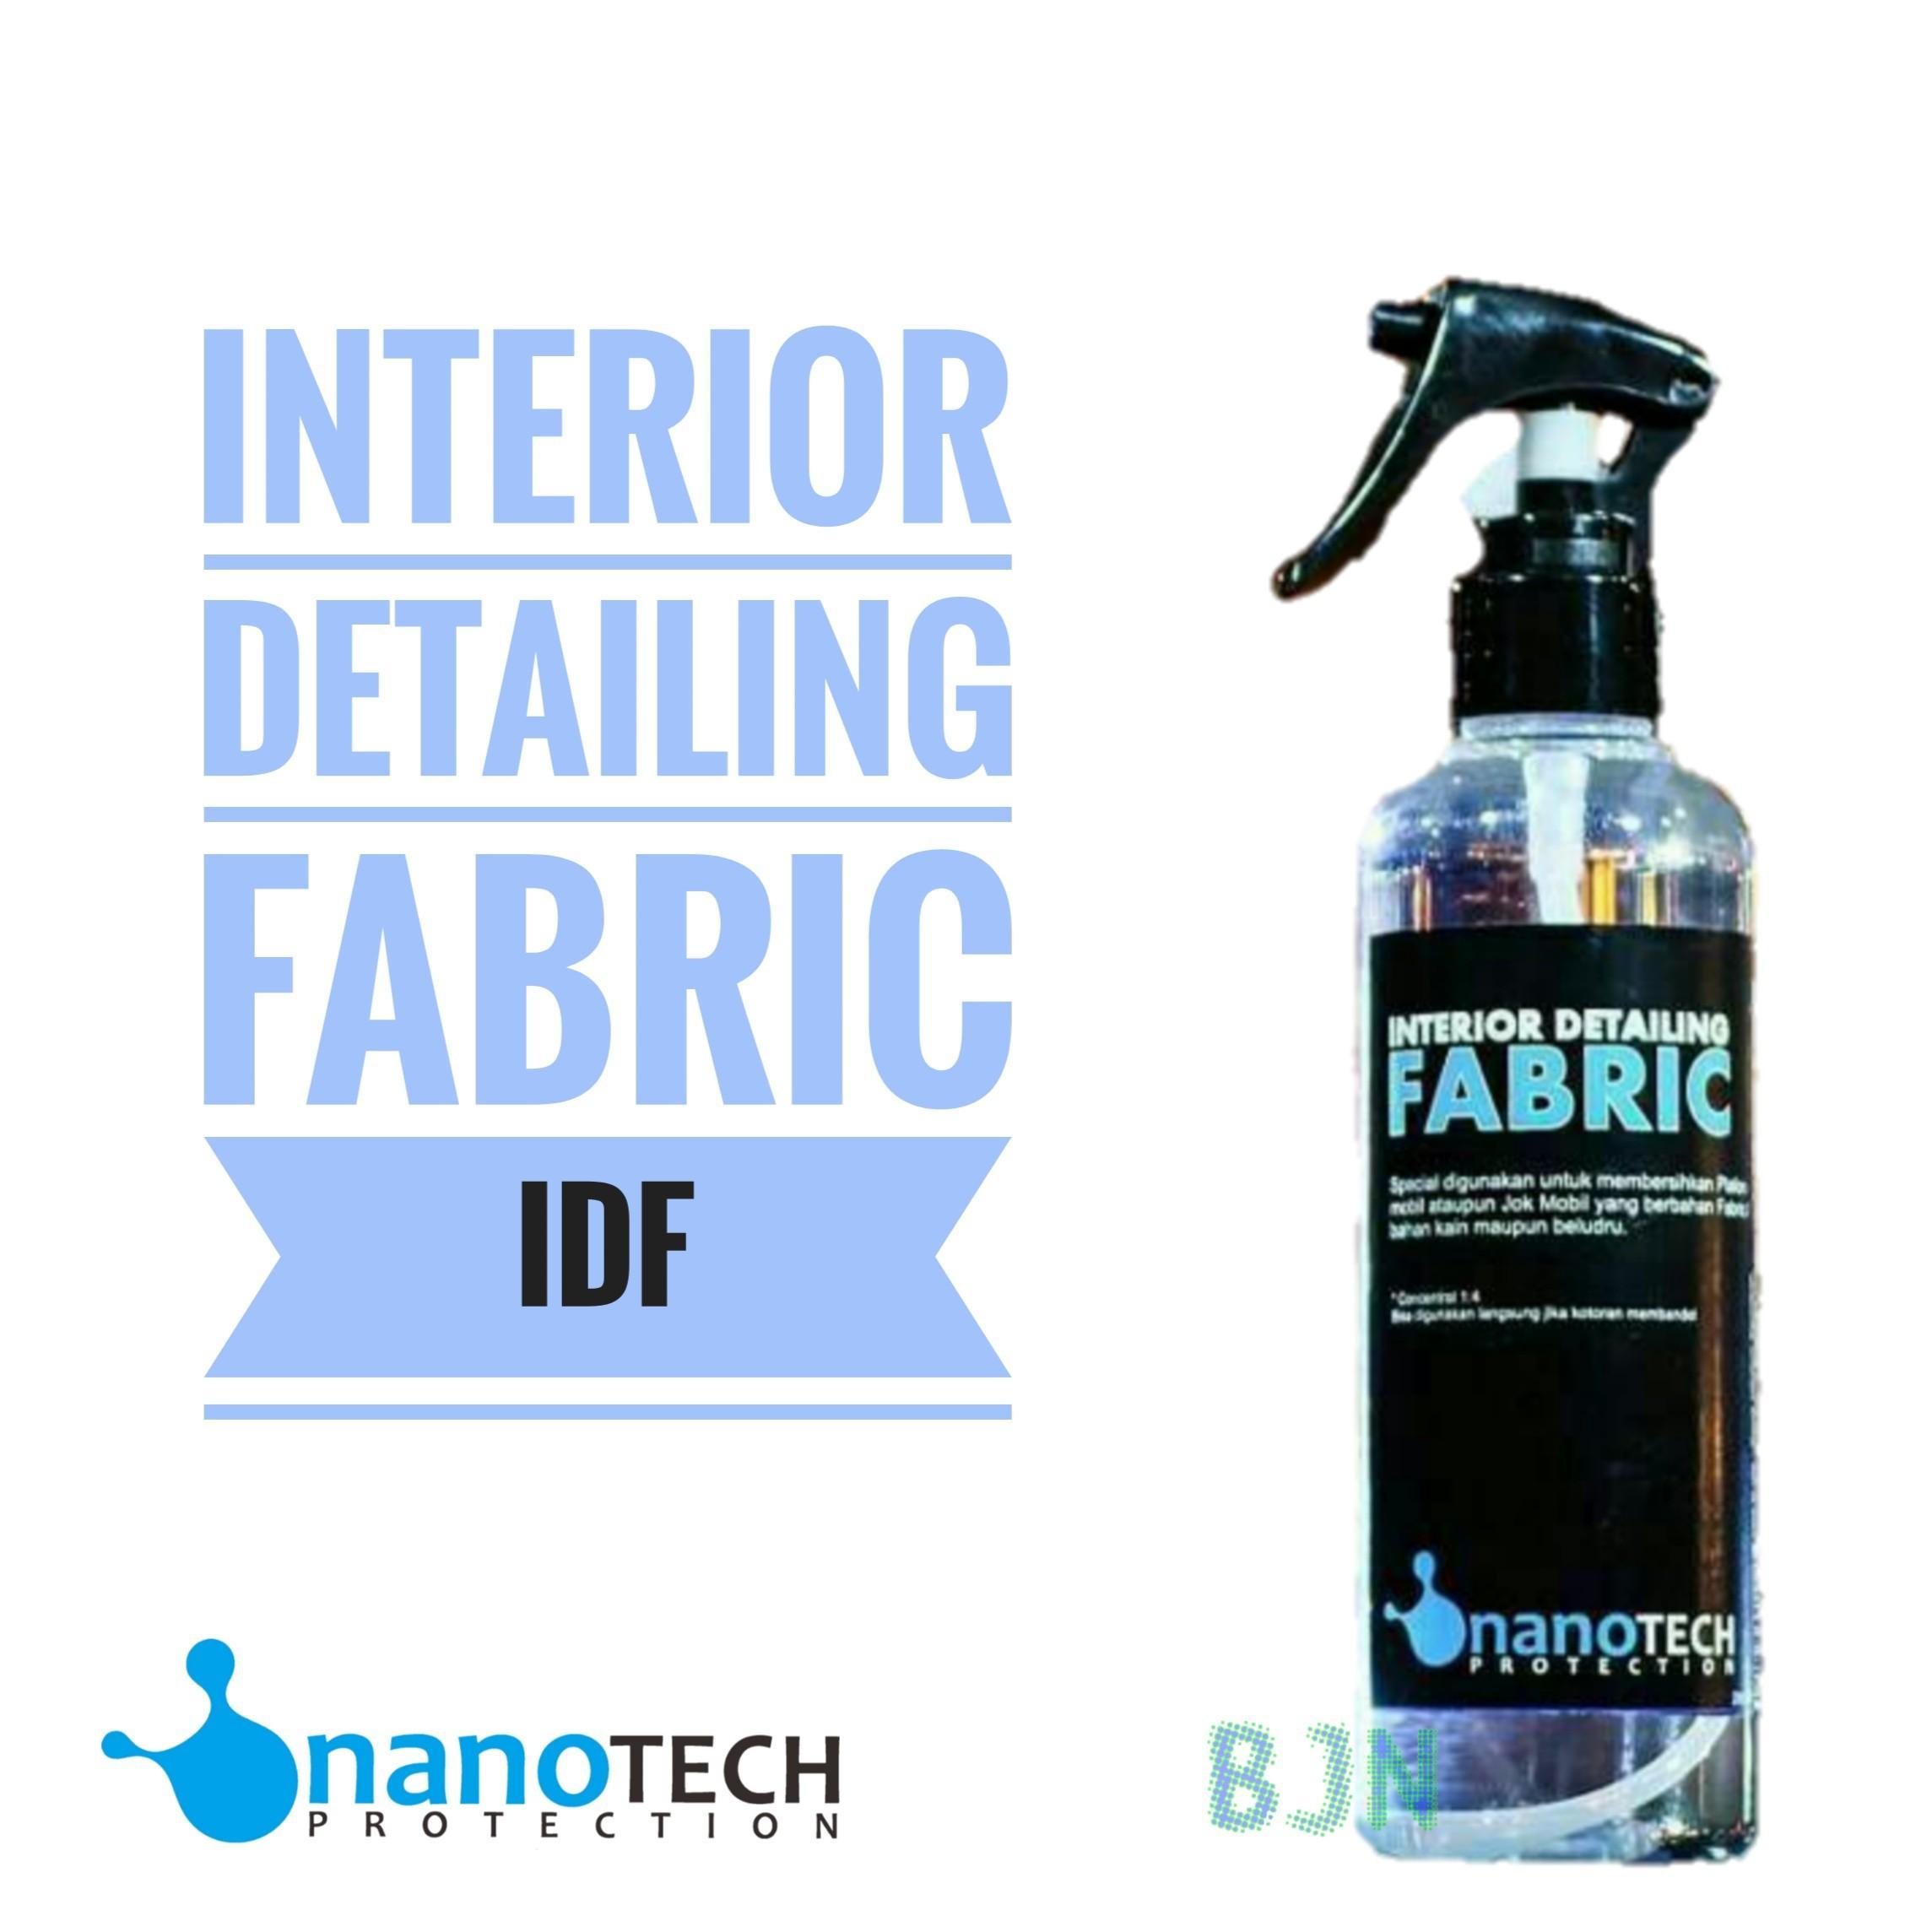 Interior Detailing Fabric Nanotech Pembersih Jok Plavon Bludru Plafon Kotor Dan Interior Kain Fabric Beludru By Nanotech Protection Store Sby.